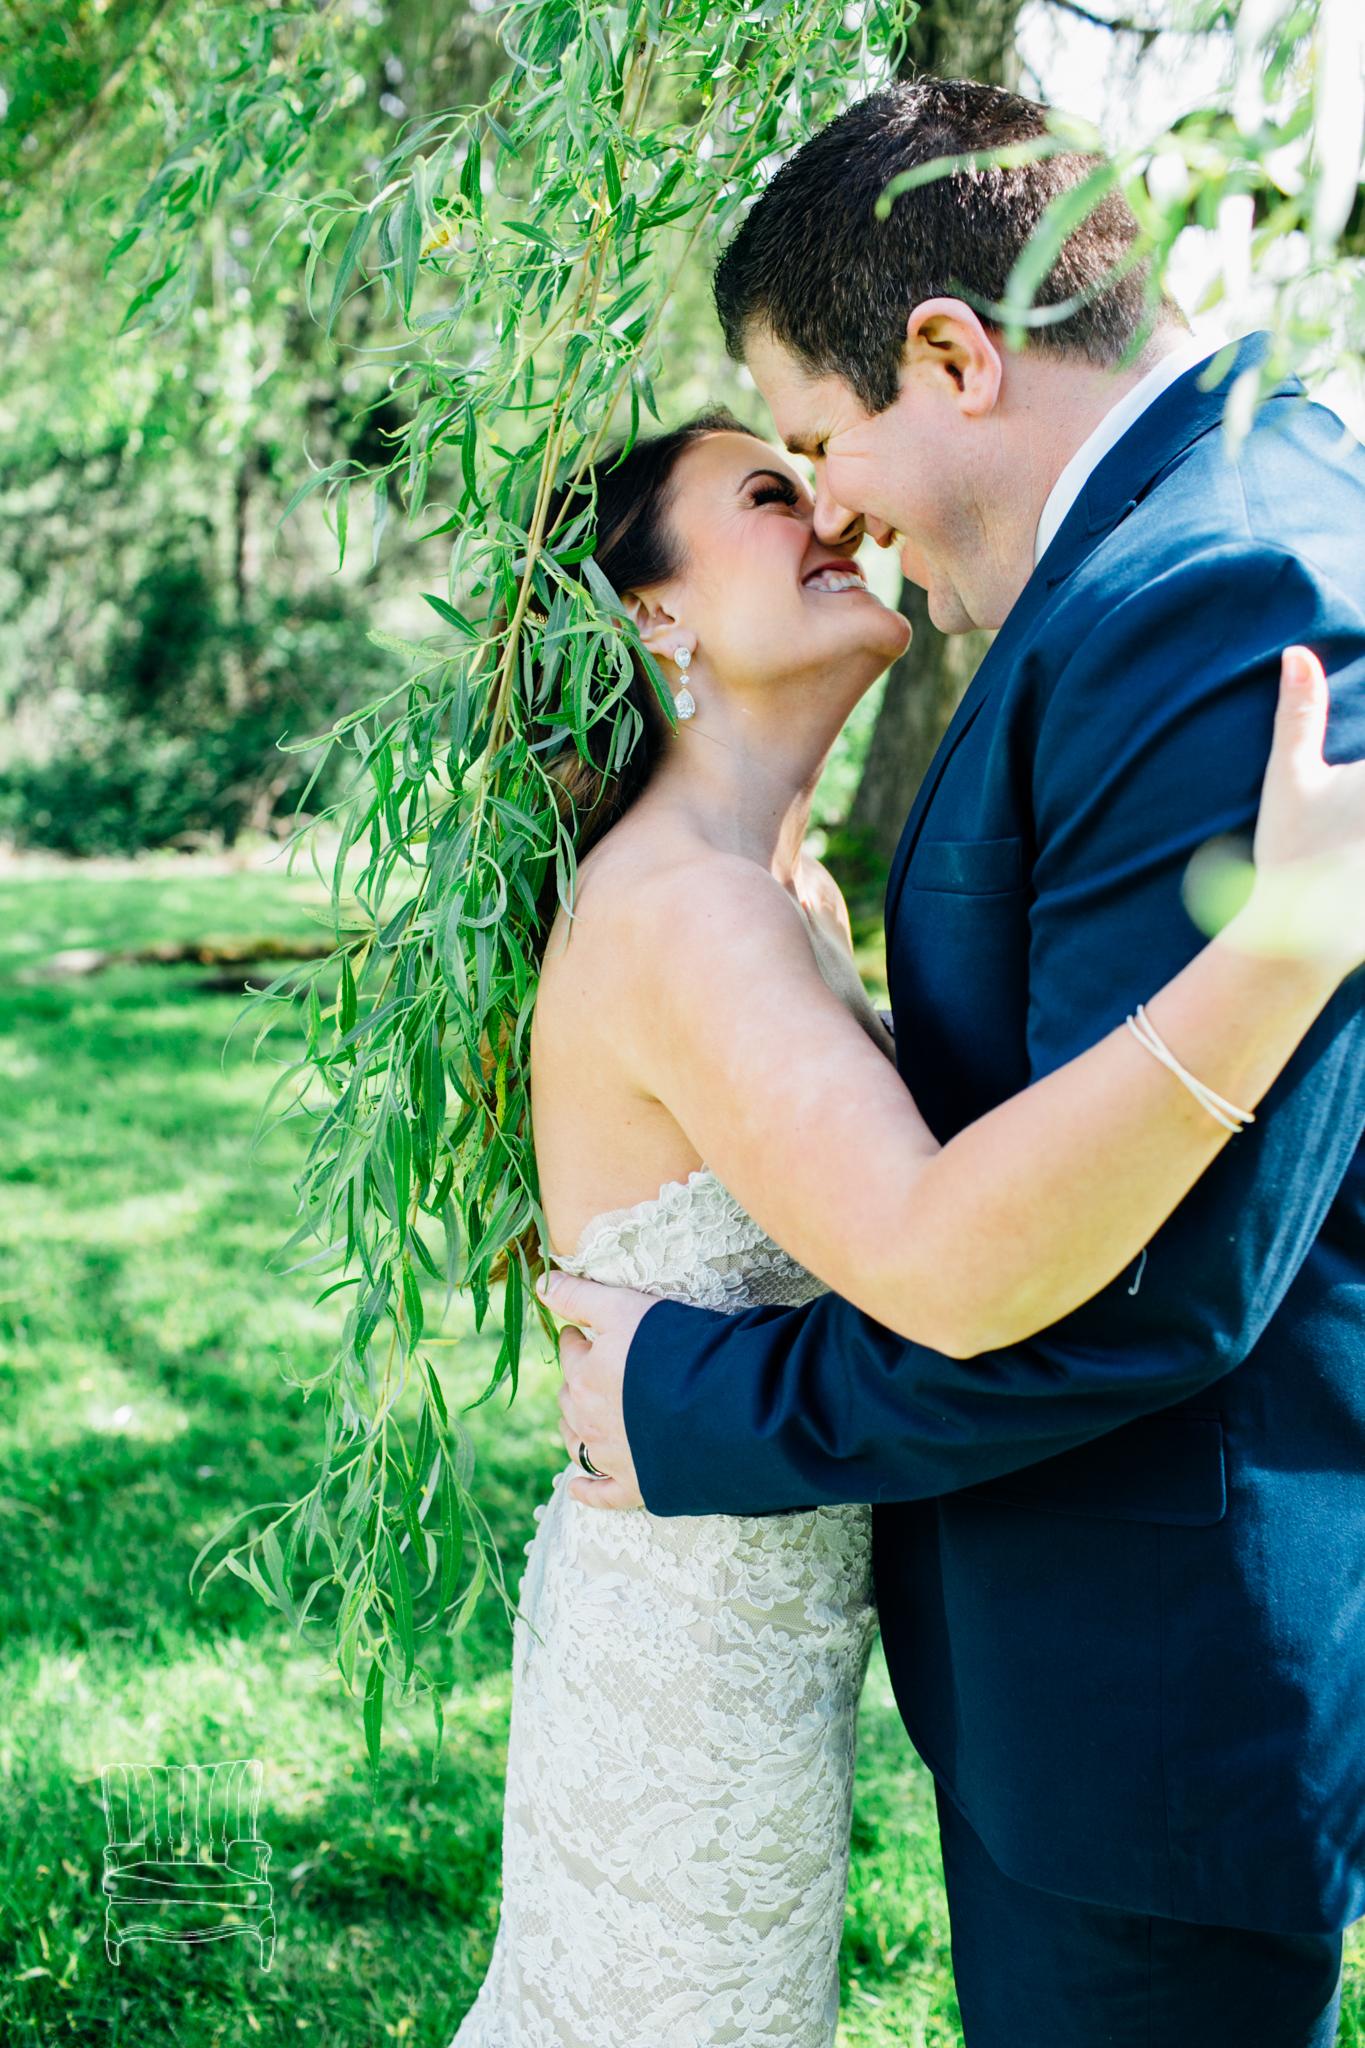 seattle-wedding-photographer-katheryn-moran-russells-bothell-wilkins-wedding-photo-24.jpg